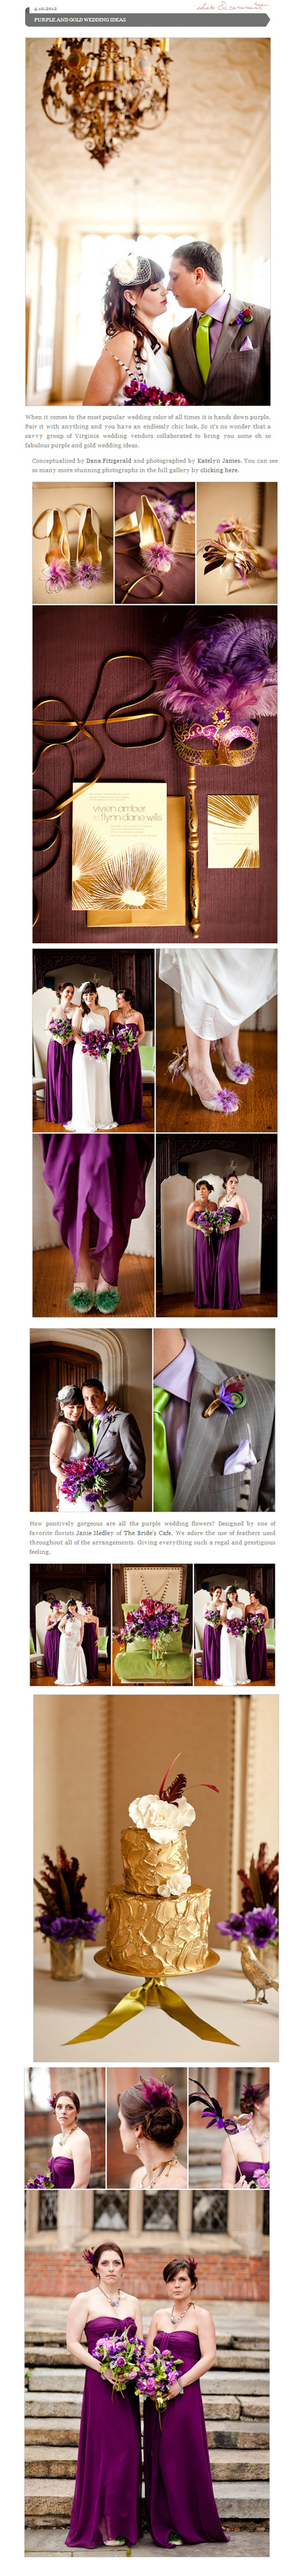 wedding-chicks-april-2012.jpg